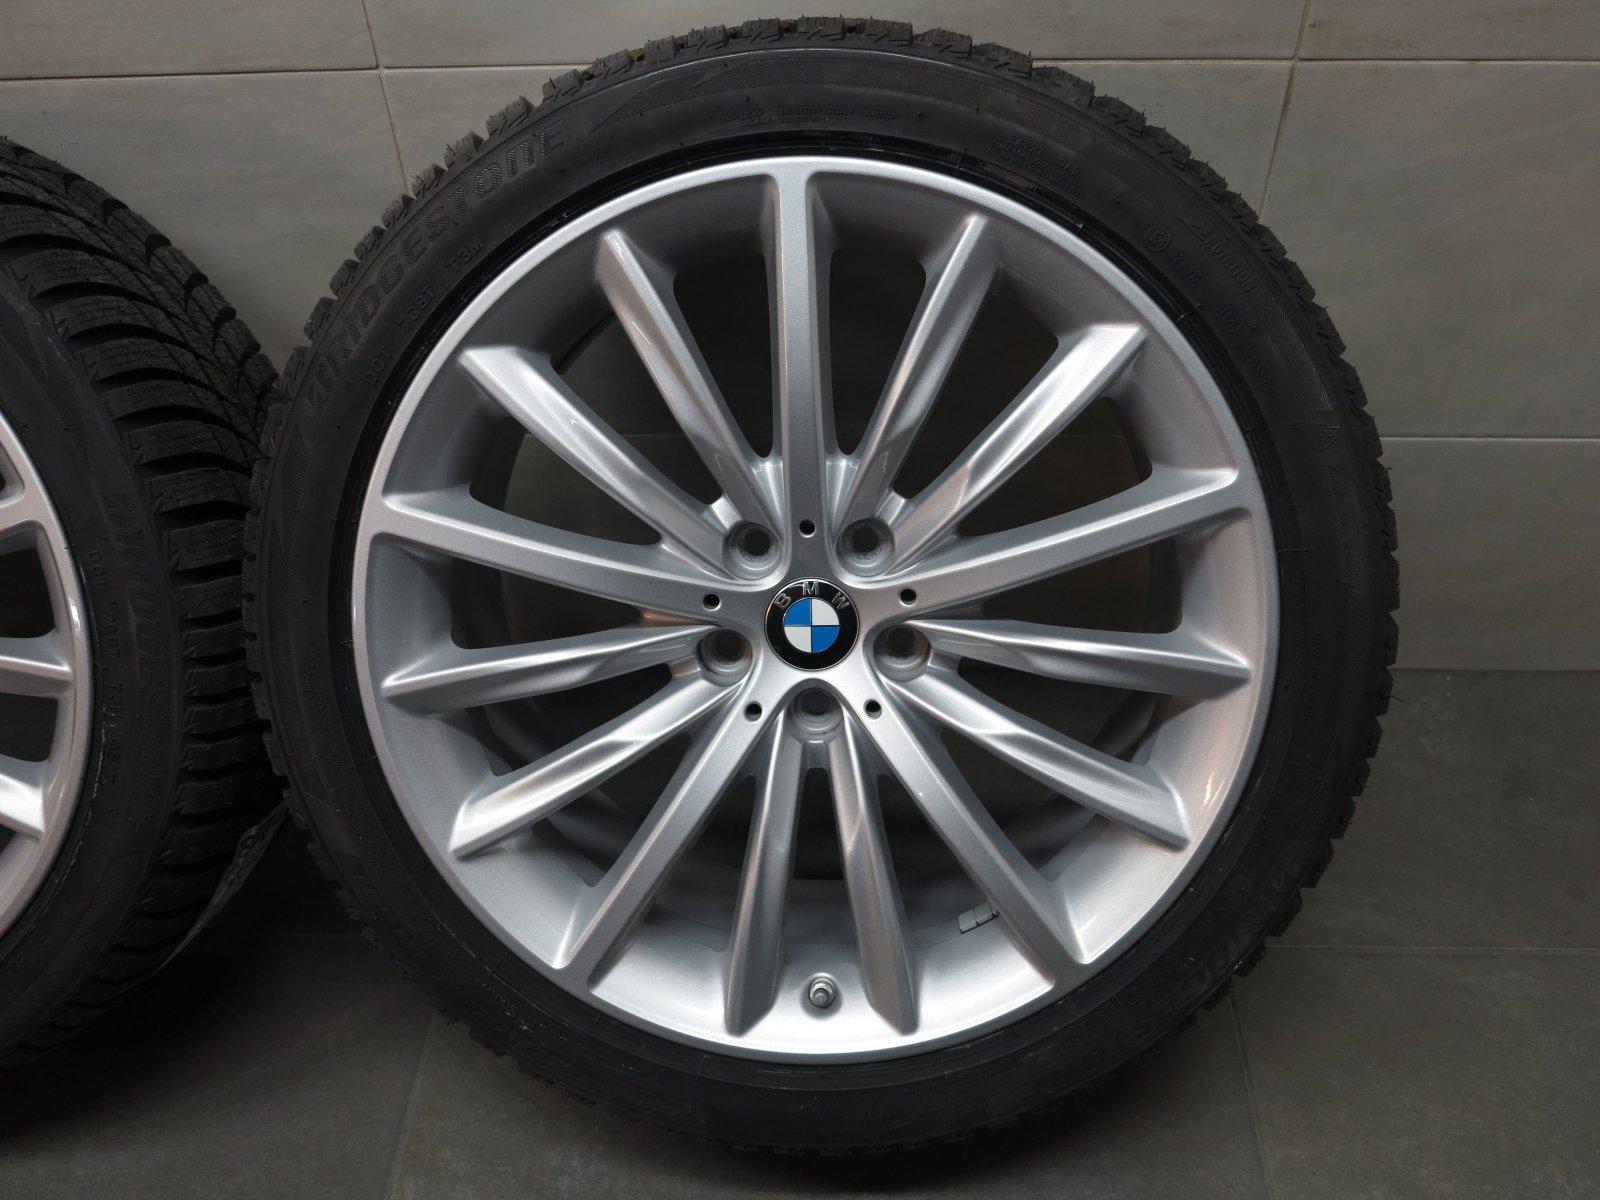 19 inch original winter wheels bmw 5 series g30 g31 rims. Black Bedroom Furniture Sets. Home Design Ideas